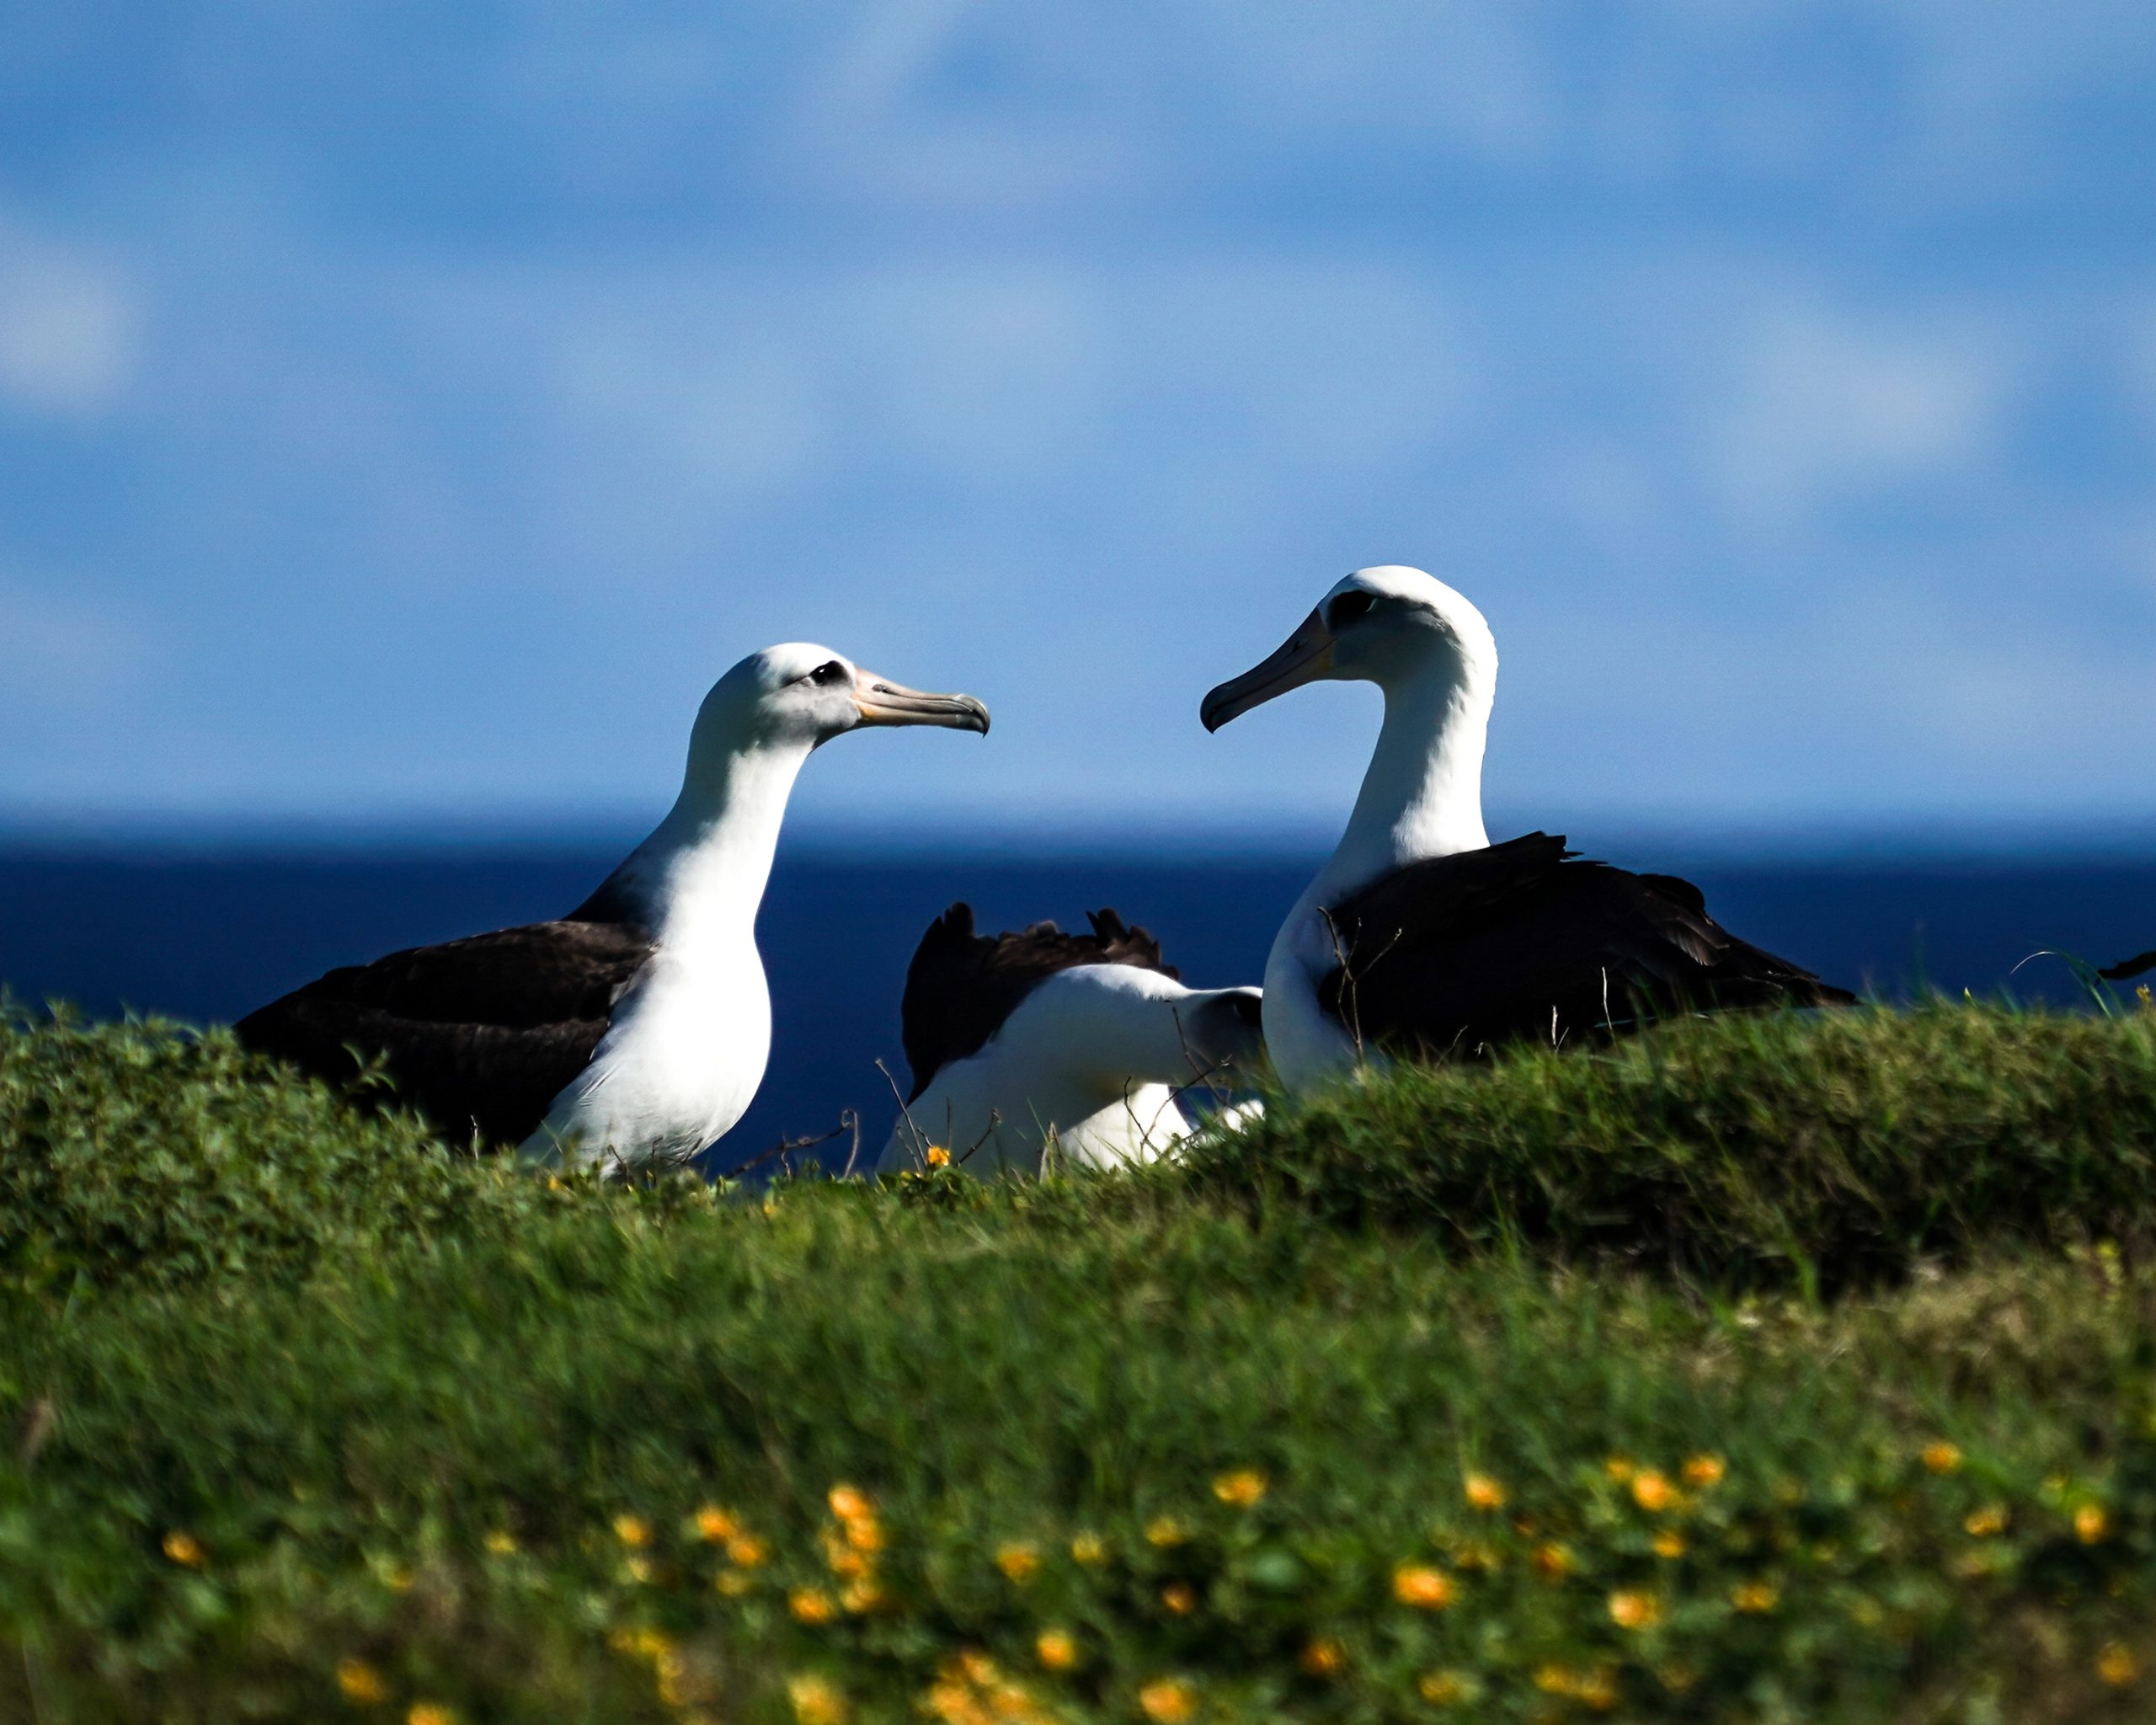 A pair of Laysan Albatross